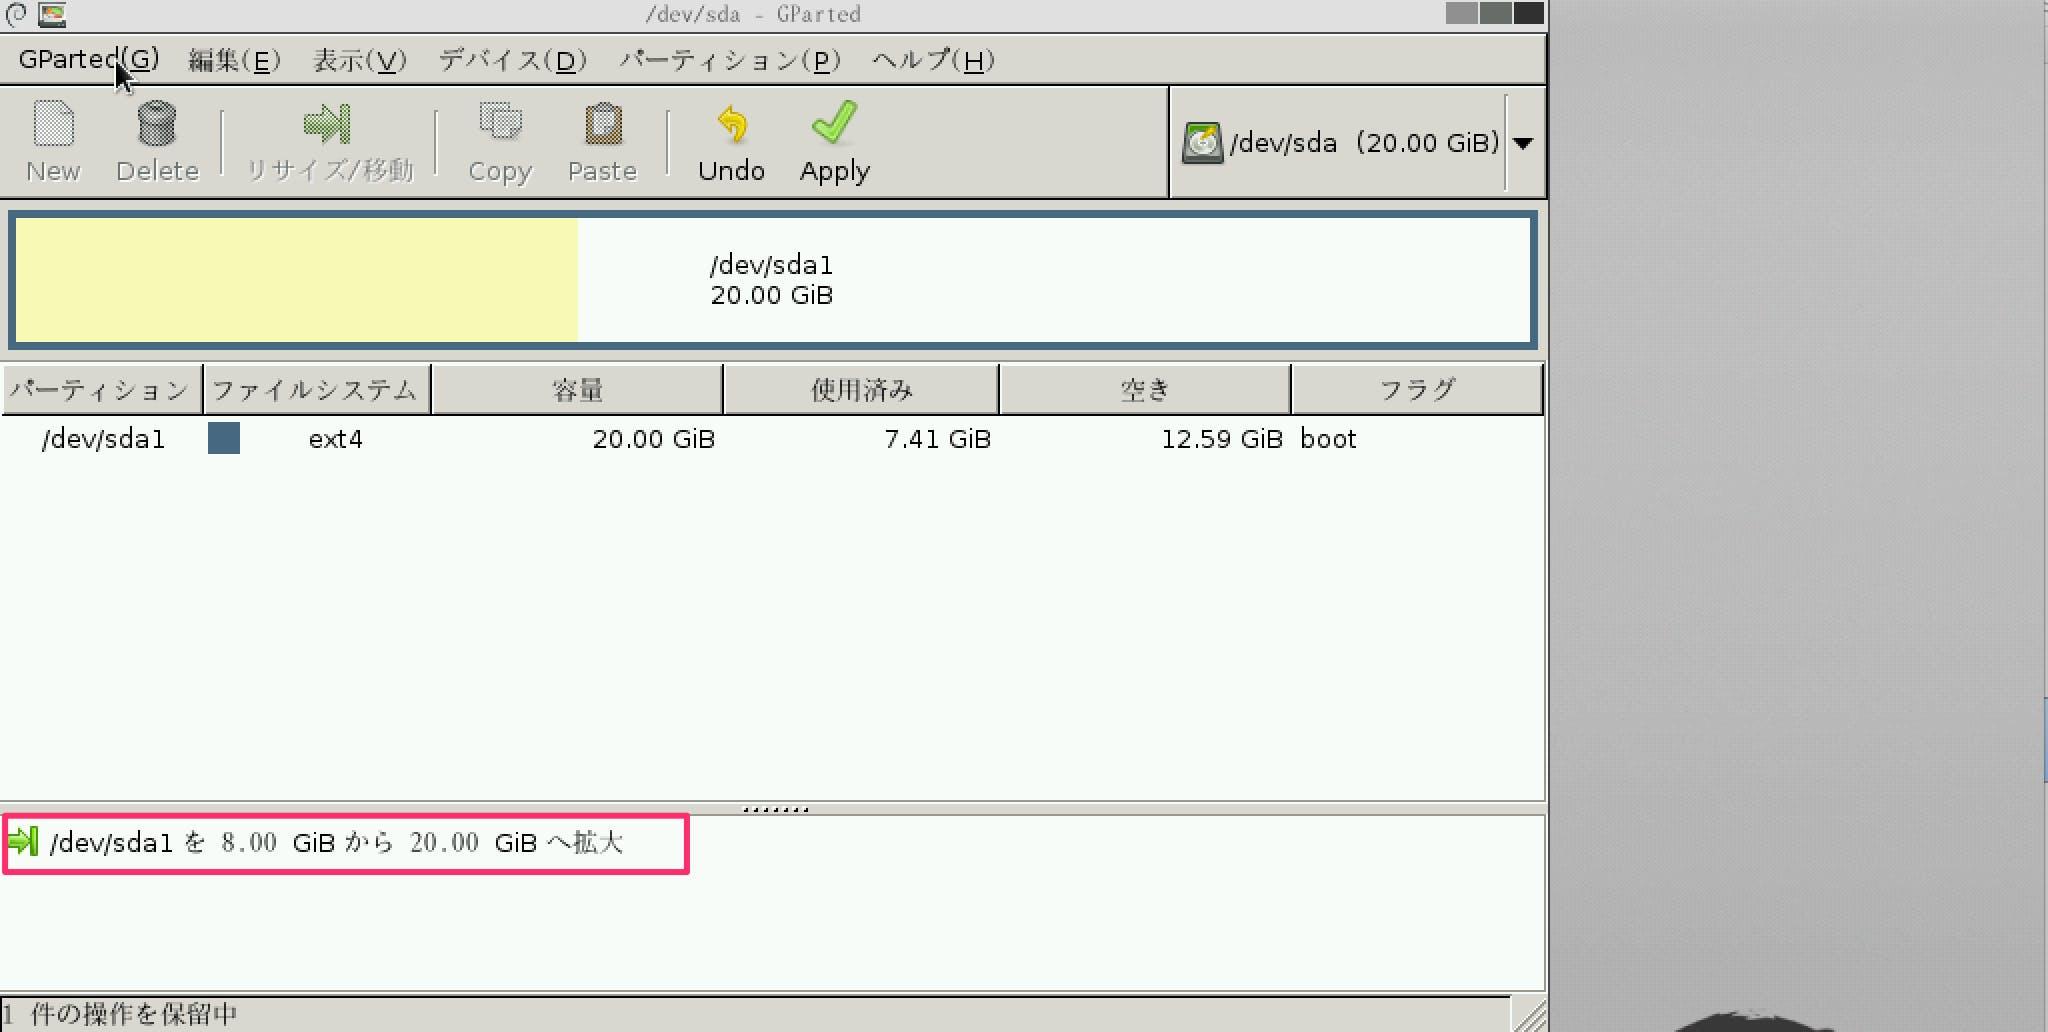 FC_default_1457173043946_65450__Running__と_Oracle_VM_VirtualBox_マネージャー.png